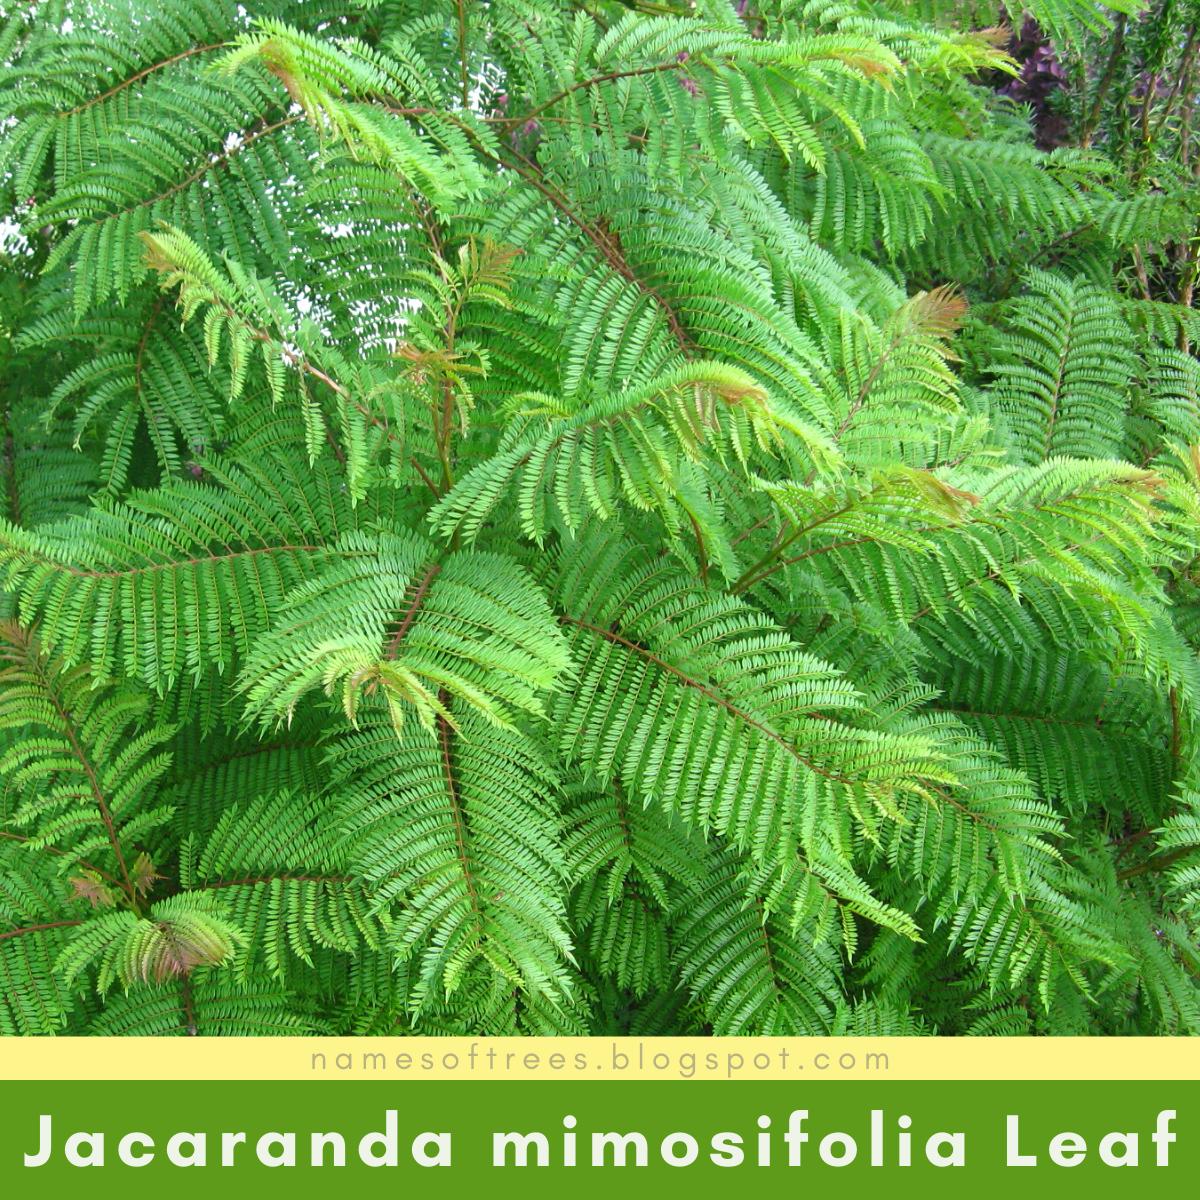 Characteristics Of Jacaranda Tree Jacaranda Mimosifolia In The Wild Names Of Trees